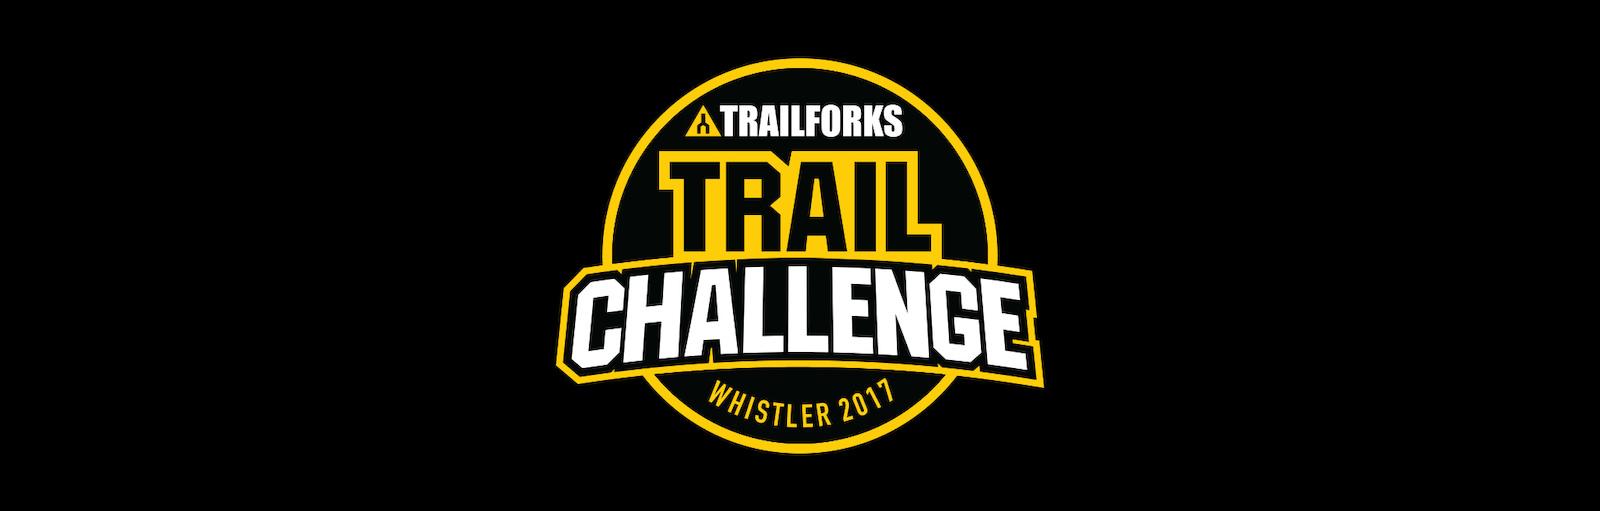 Trailforks Trail Challenge - Crankworx Whistler 2017